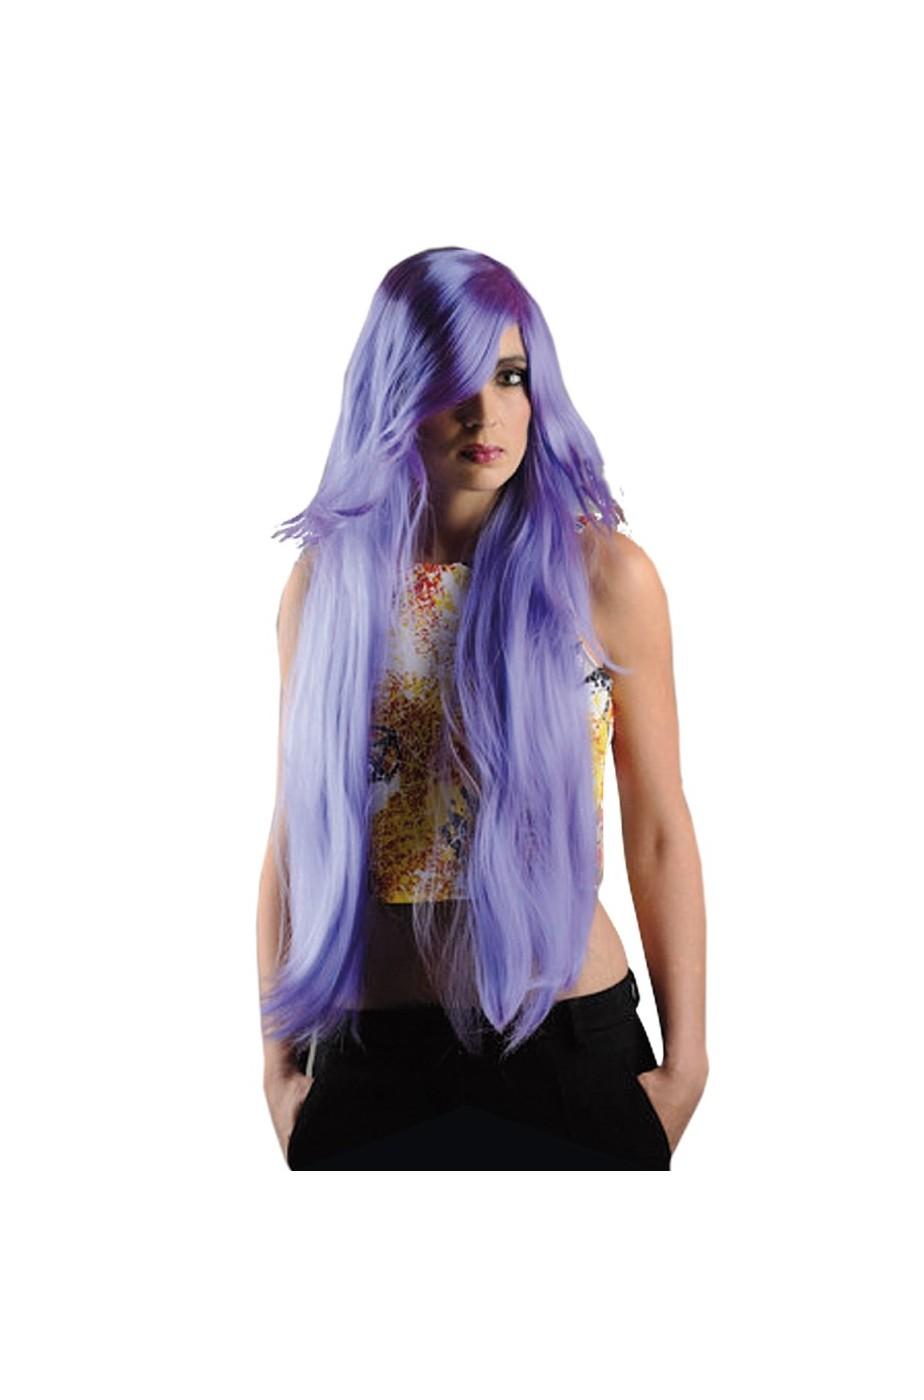 Bellissima parrucca di carnevale cosplay Anime Manga viola